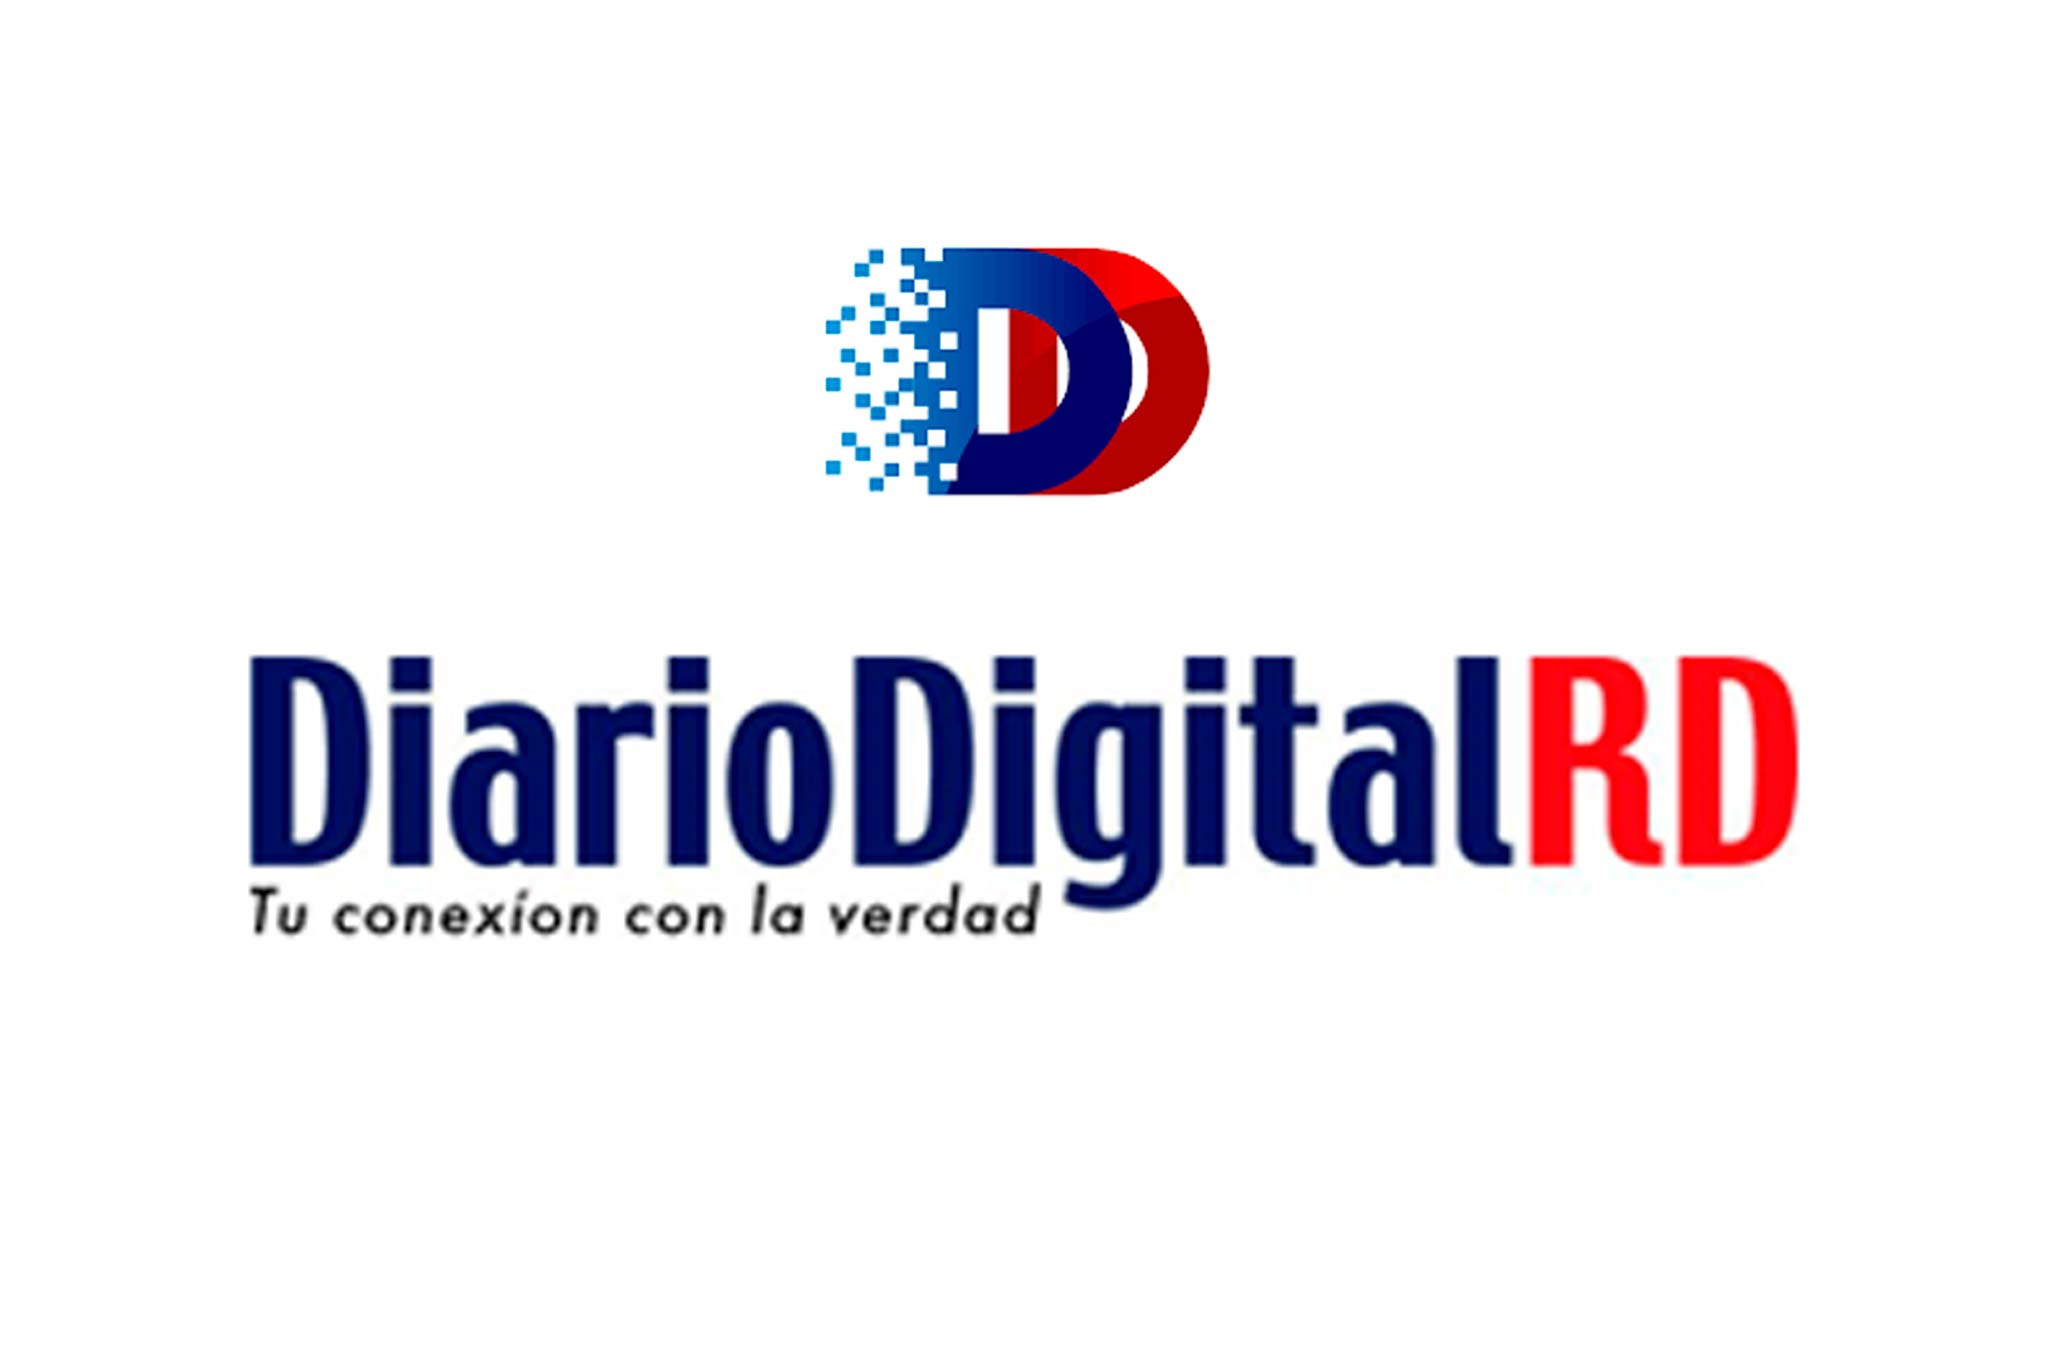 DIARIO-DIGITAL-RD